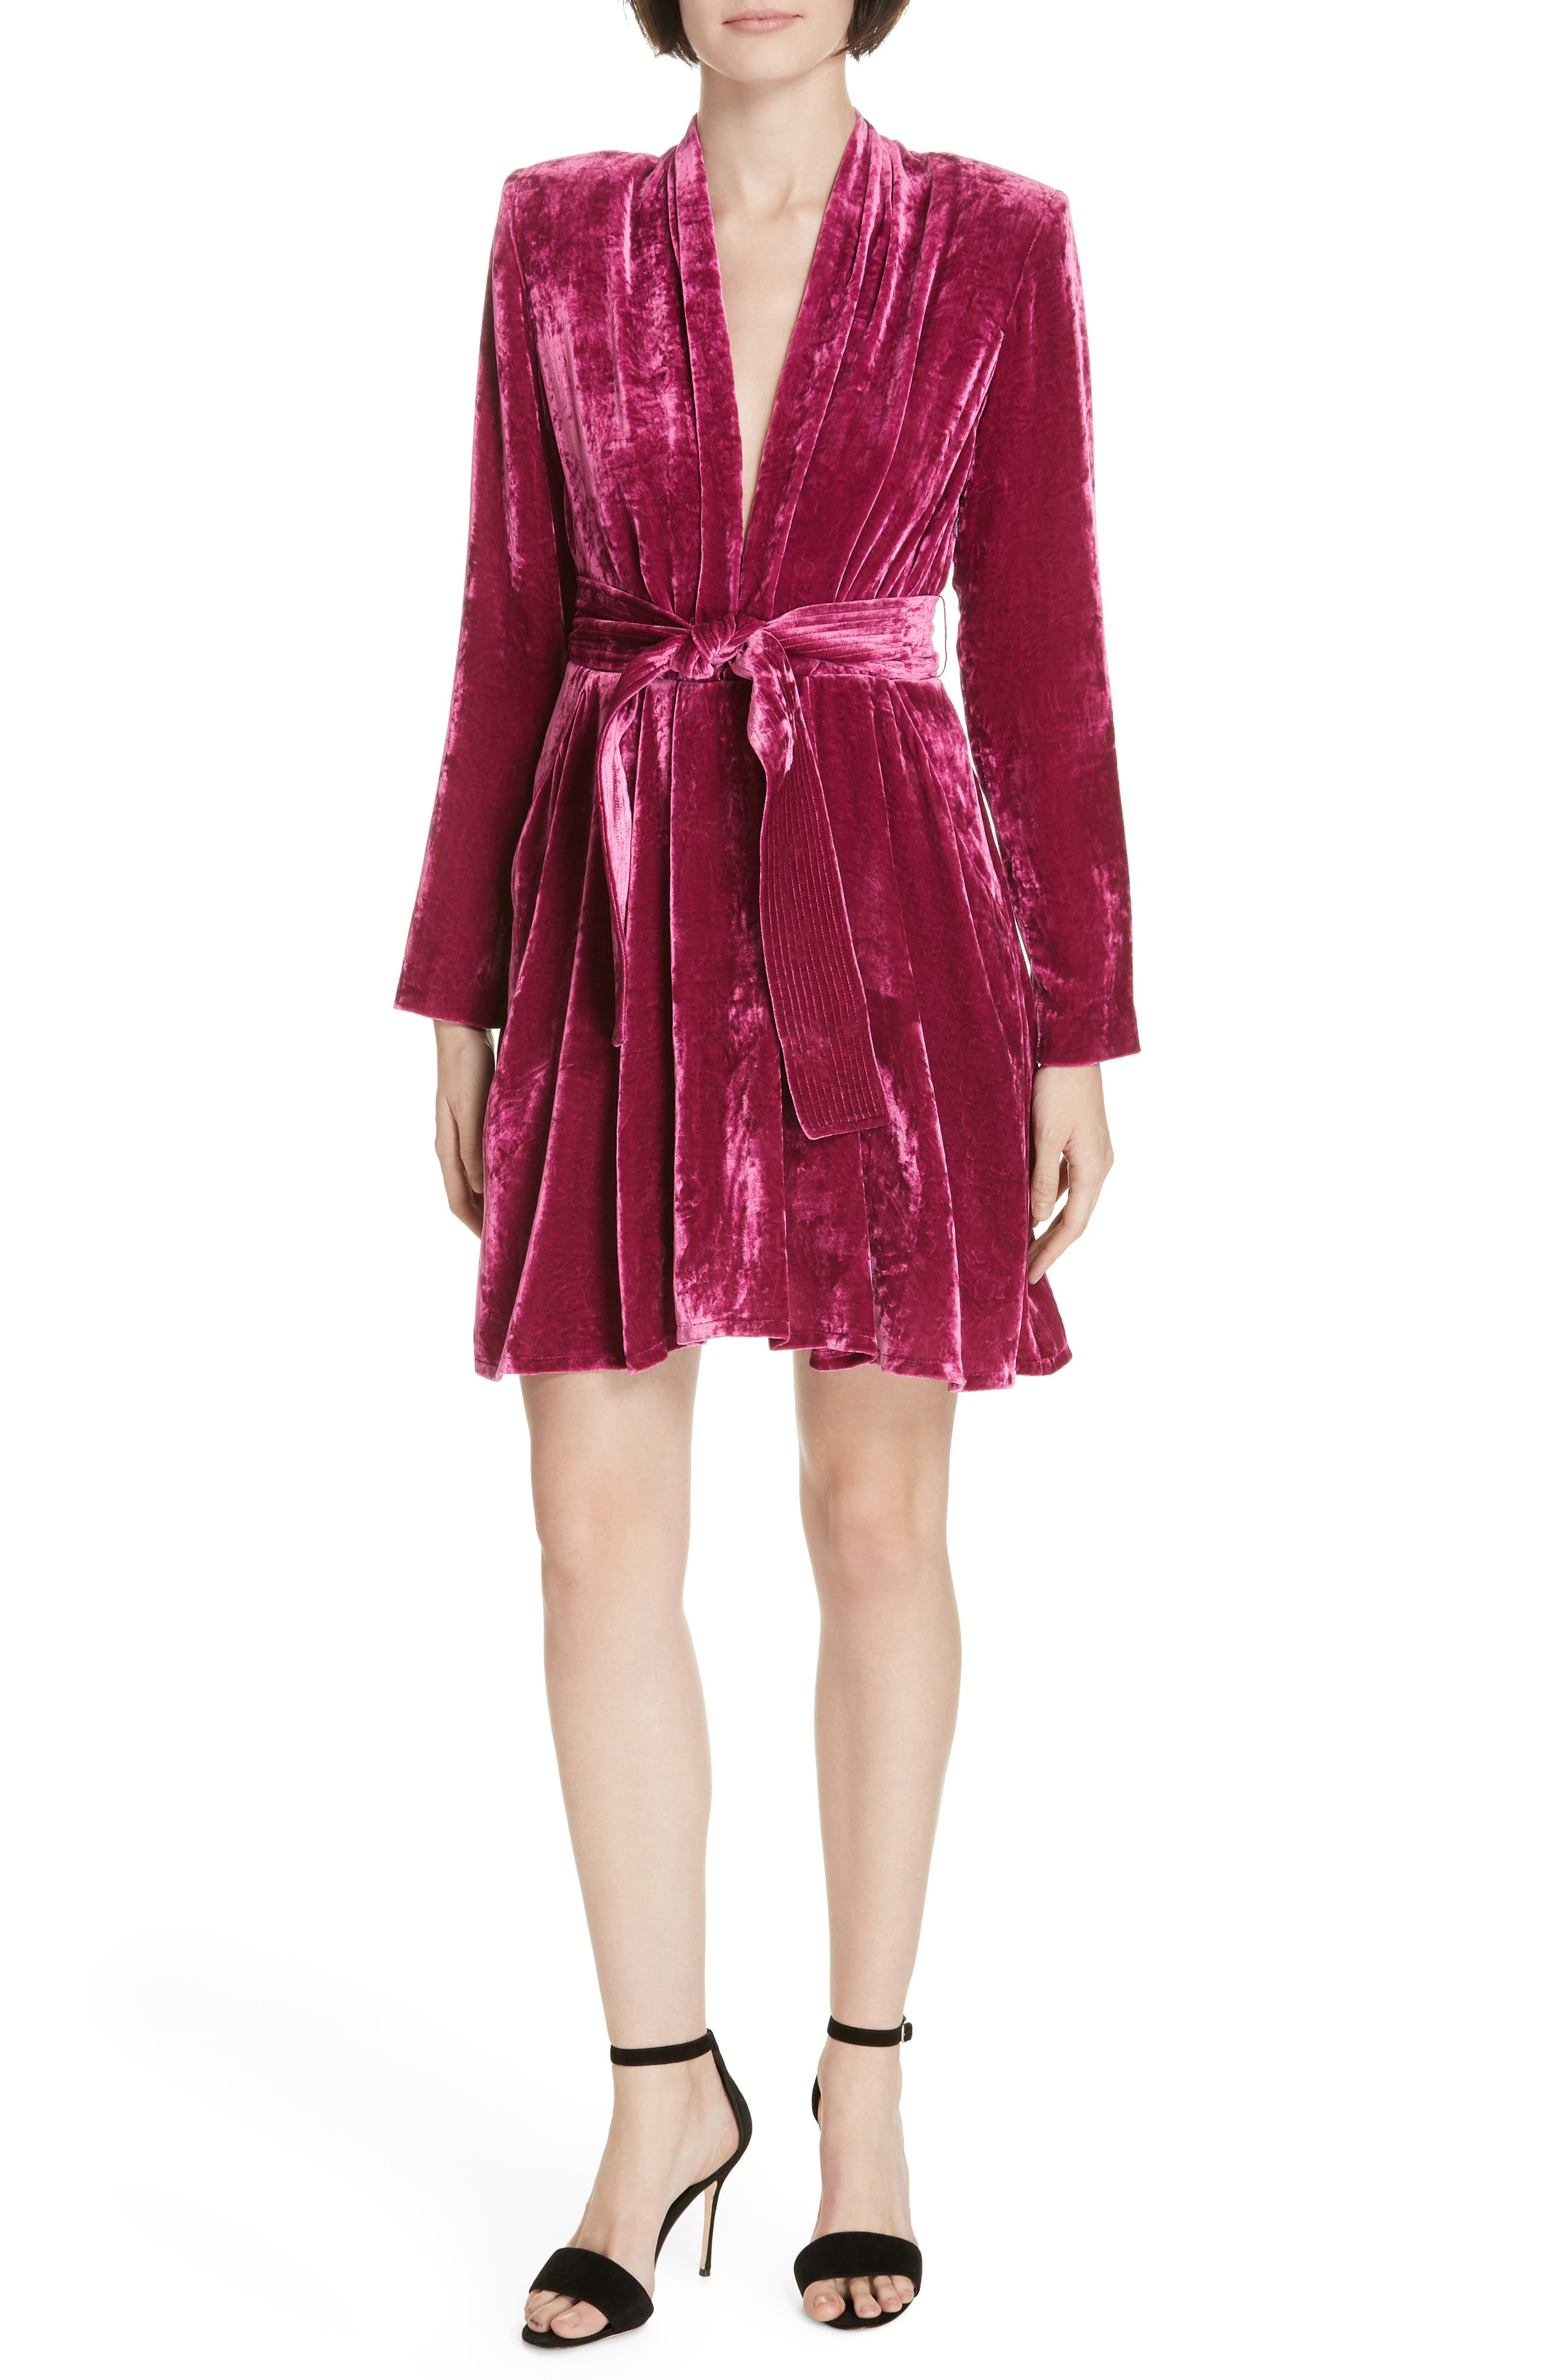 A.l.c. Kiera Crushed Velvet Minidress, Pink